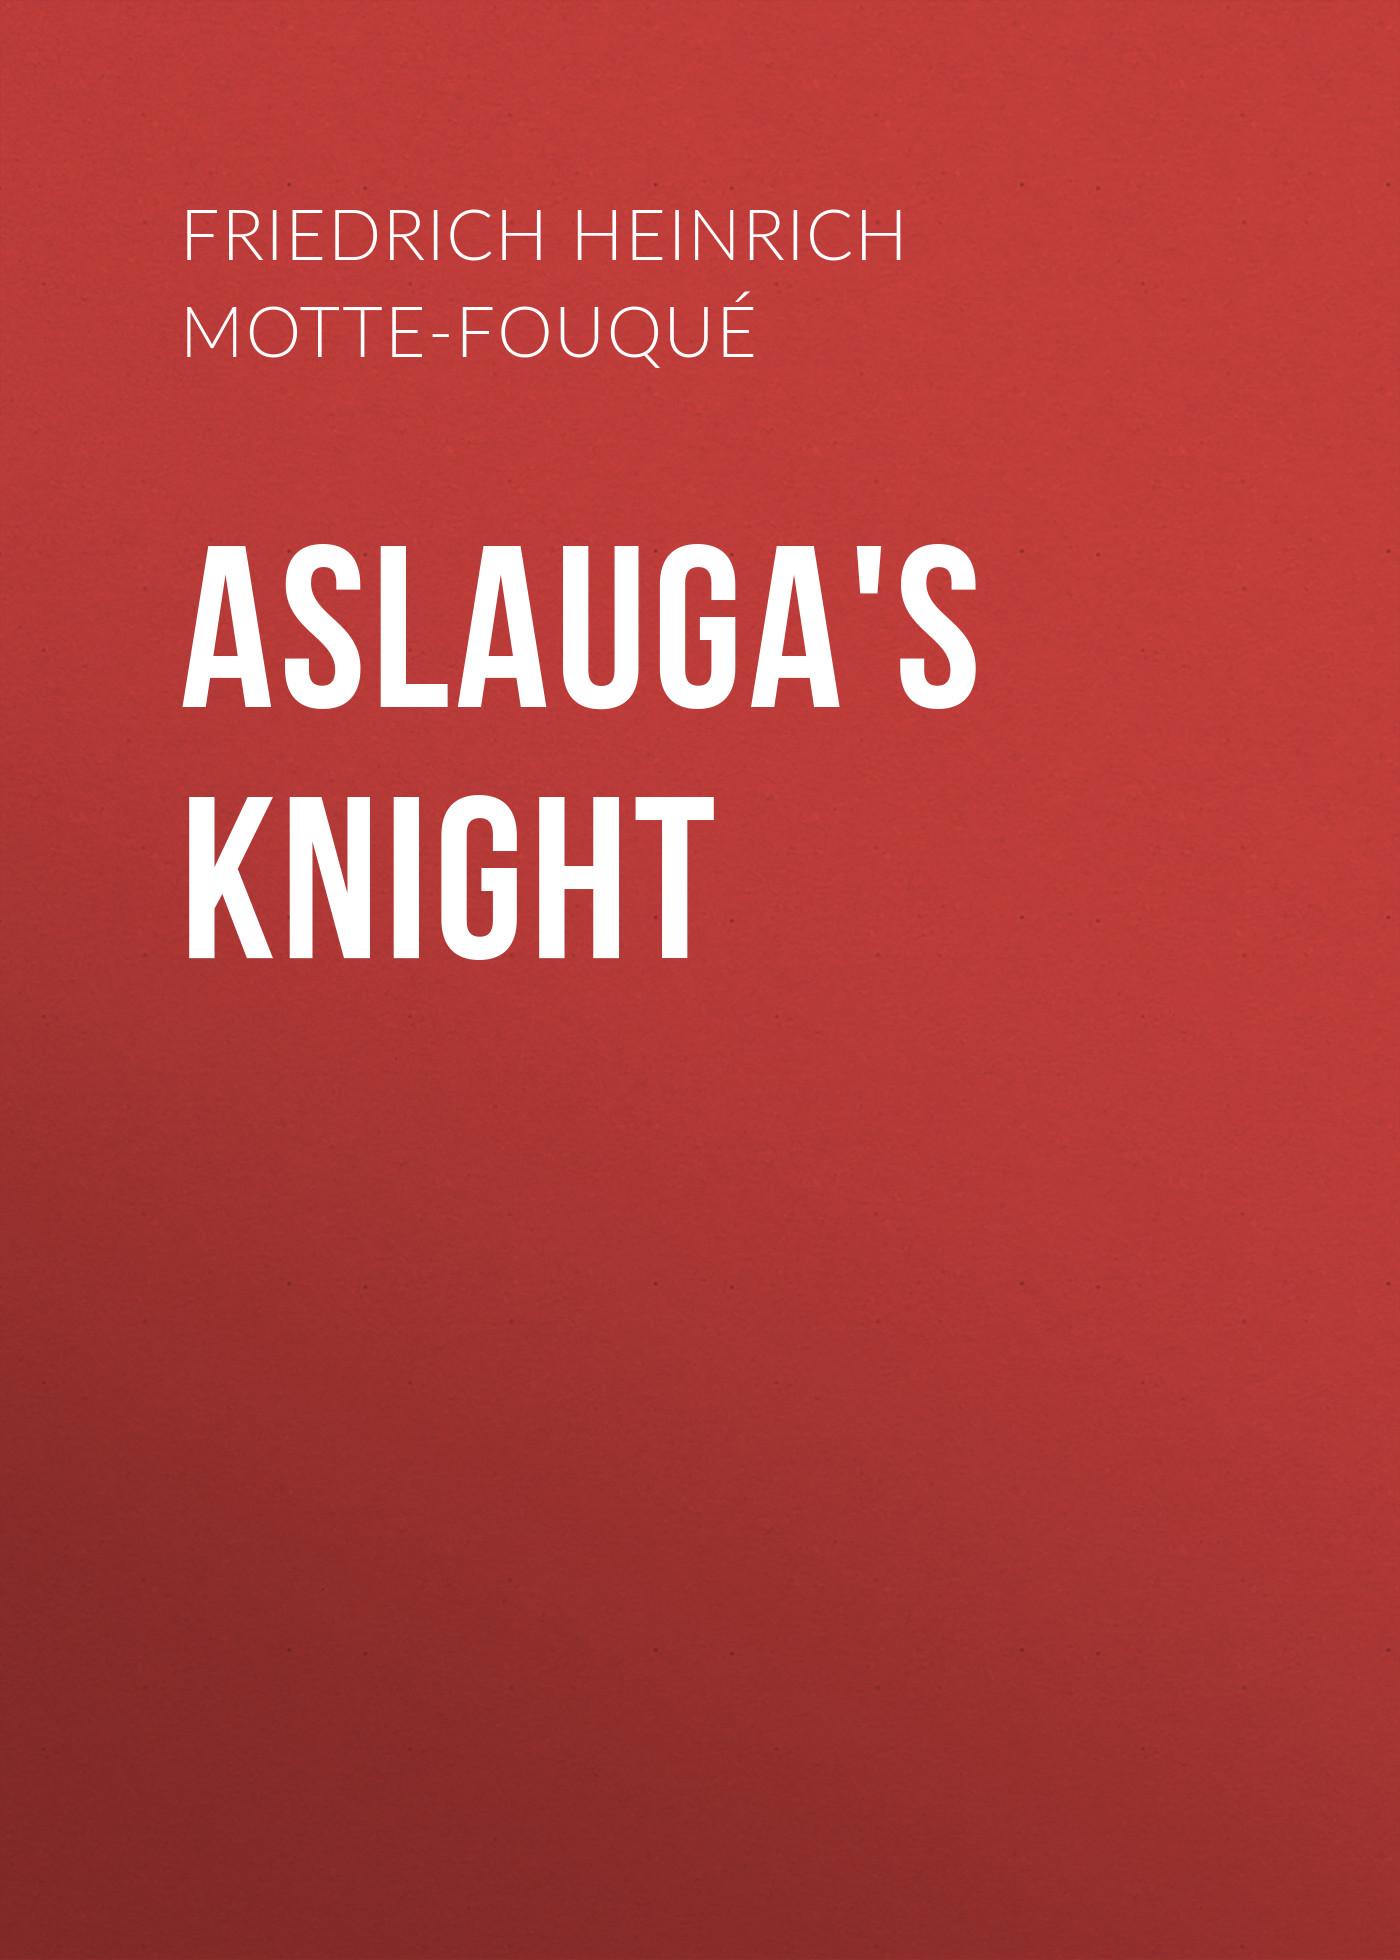 Friedrich Heinrich Karl de La Motte-Fouqué Aslauga's Knight